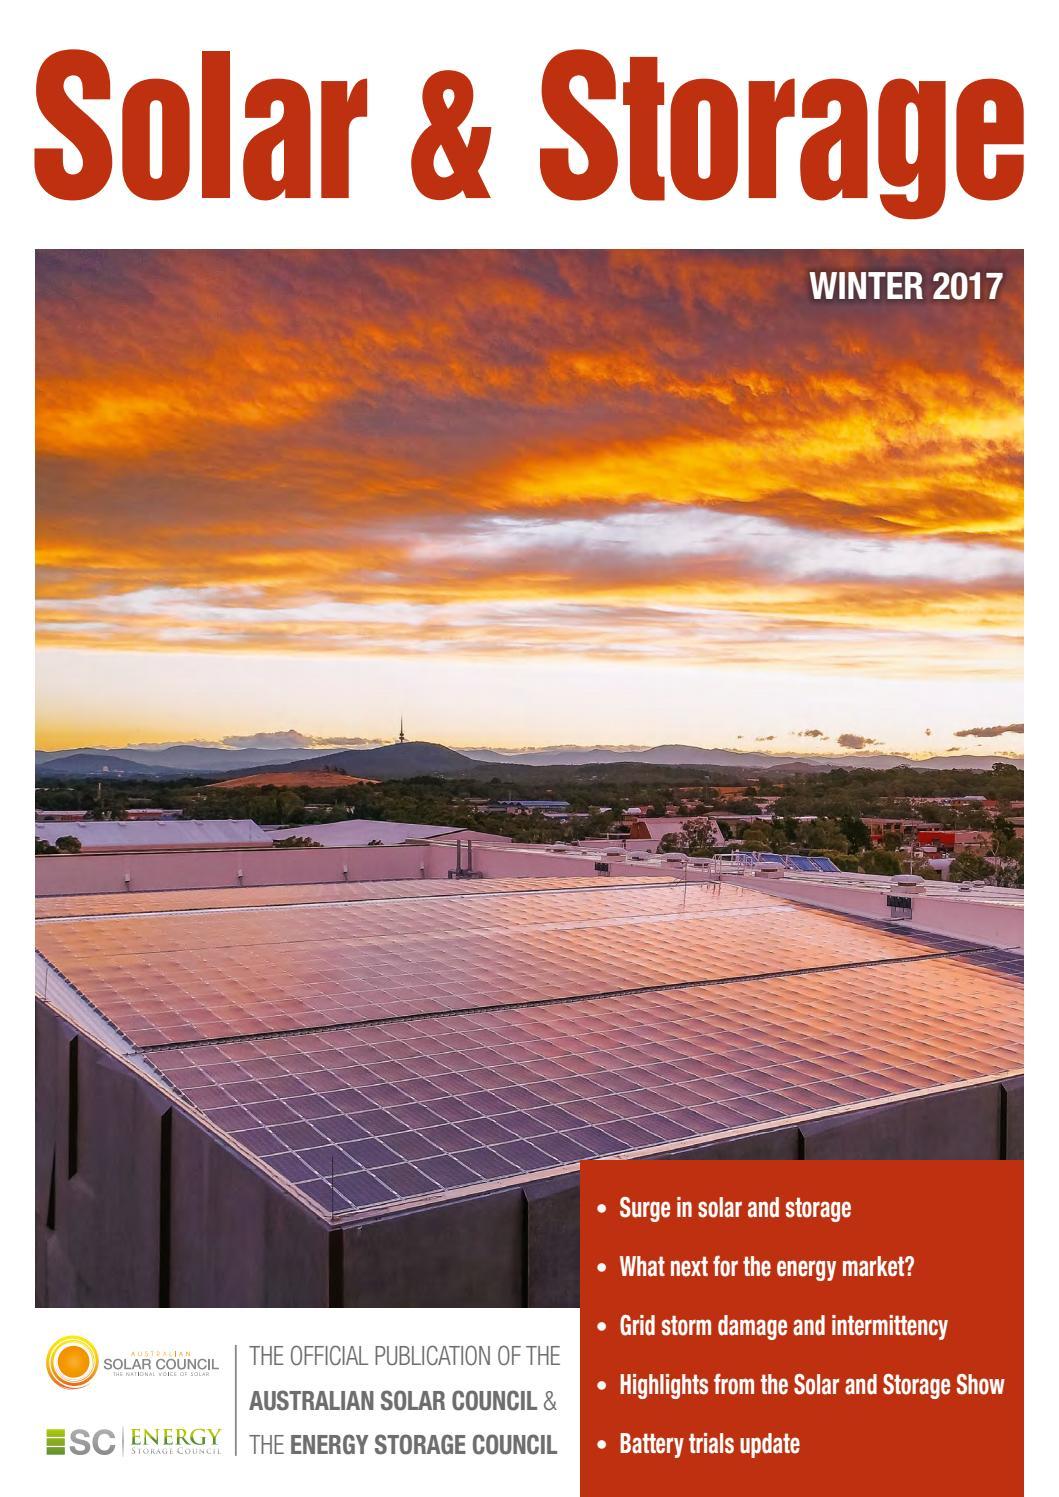 Solar Storage Winter 2017 By Smart Energy Council Issuu Empower Inverter Wiring Diagram